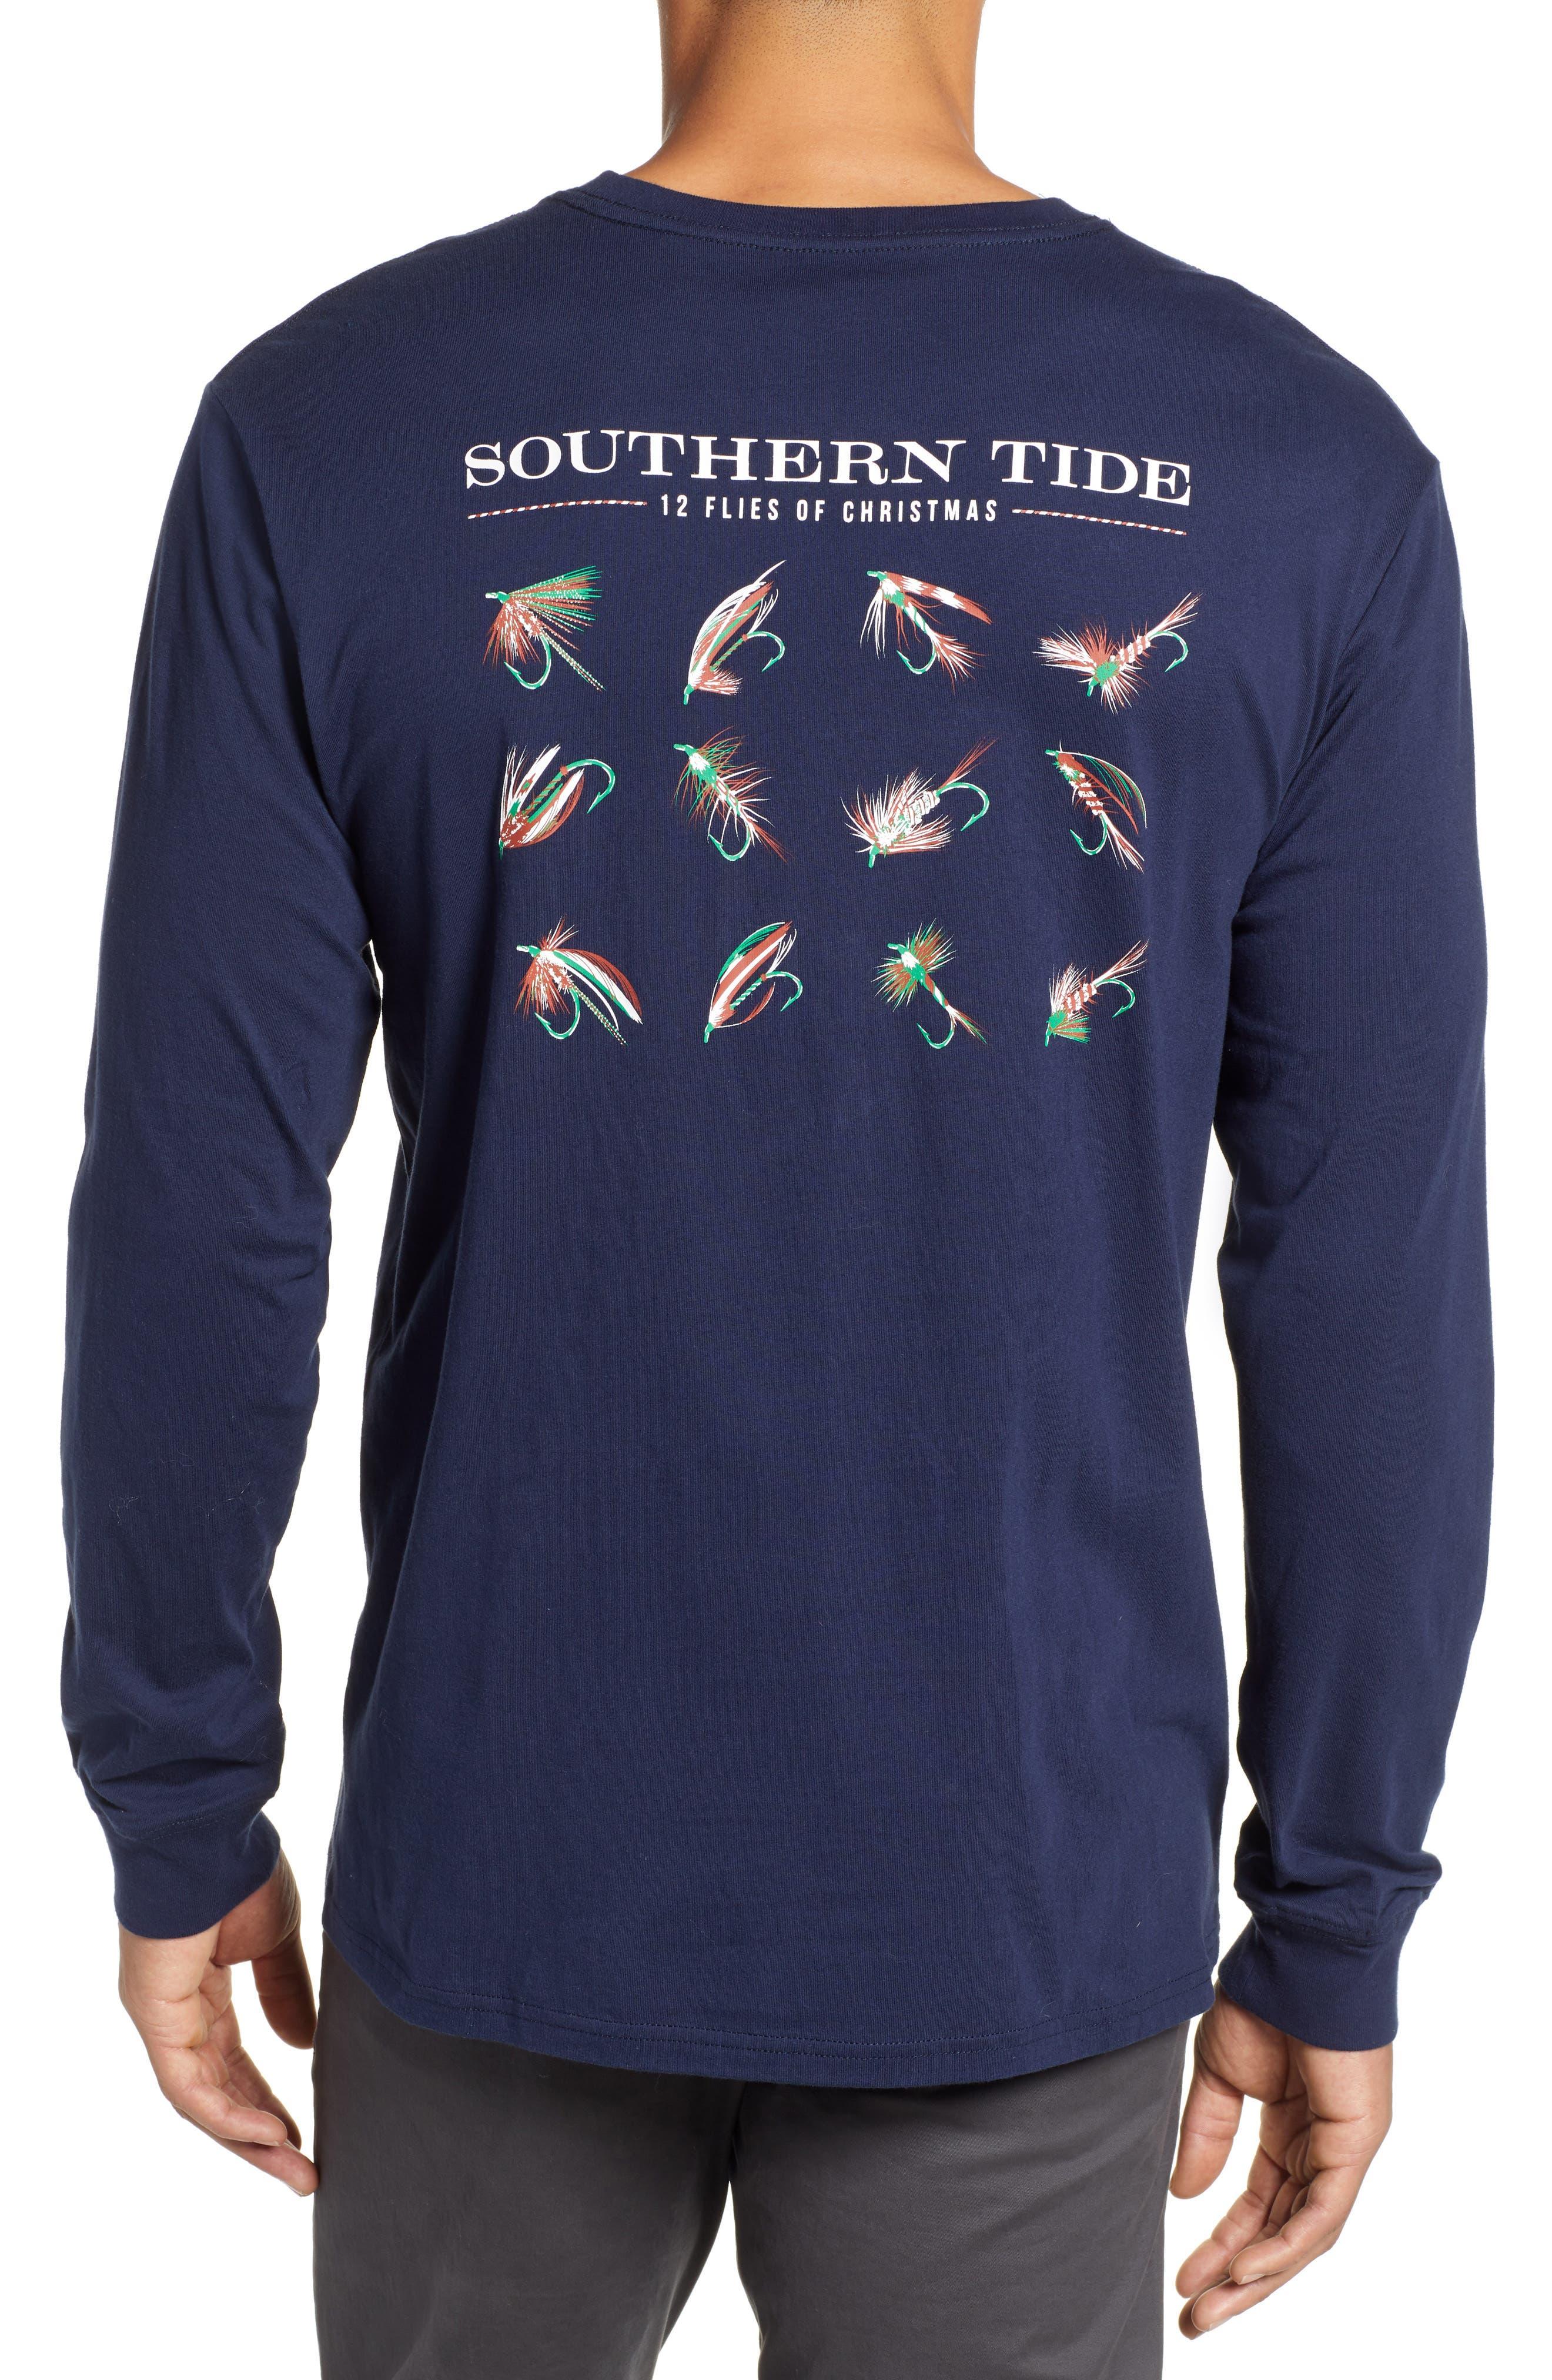 12 Flies of Christmas T-Shirt,                             Alternate thumbnail 2, color,                             TRUE NAVY